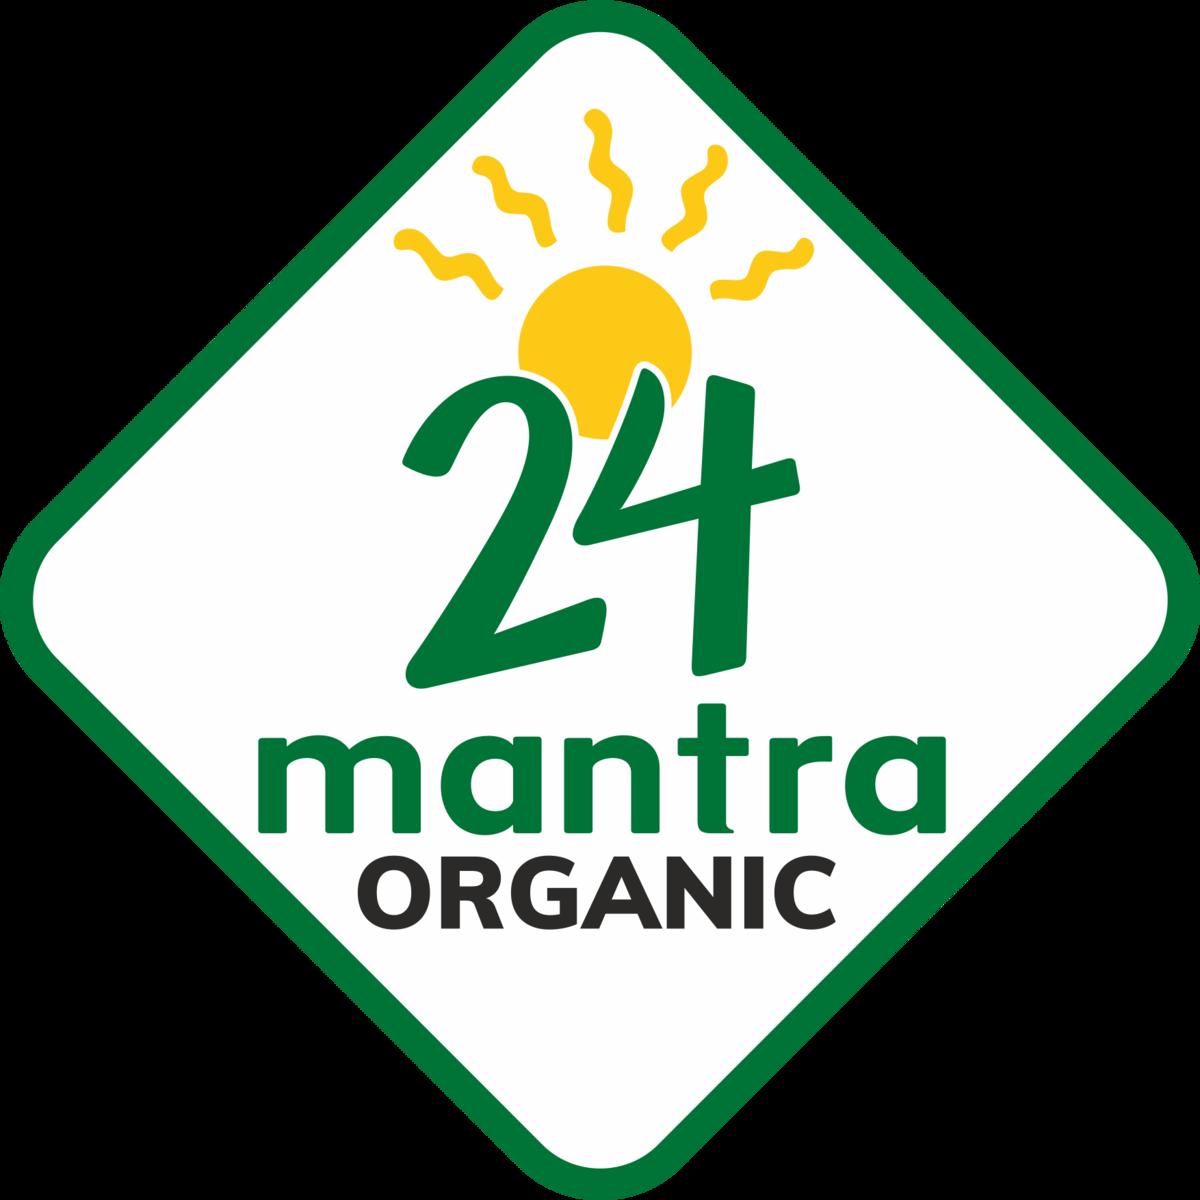 """24 Mantra organic"""